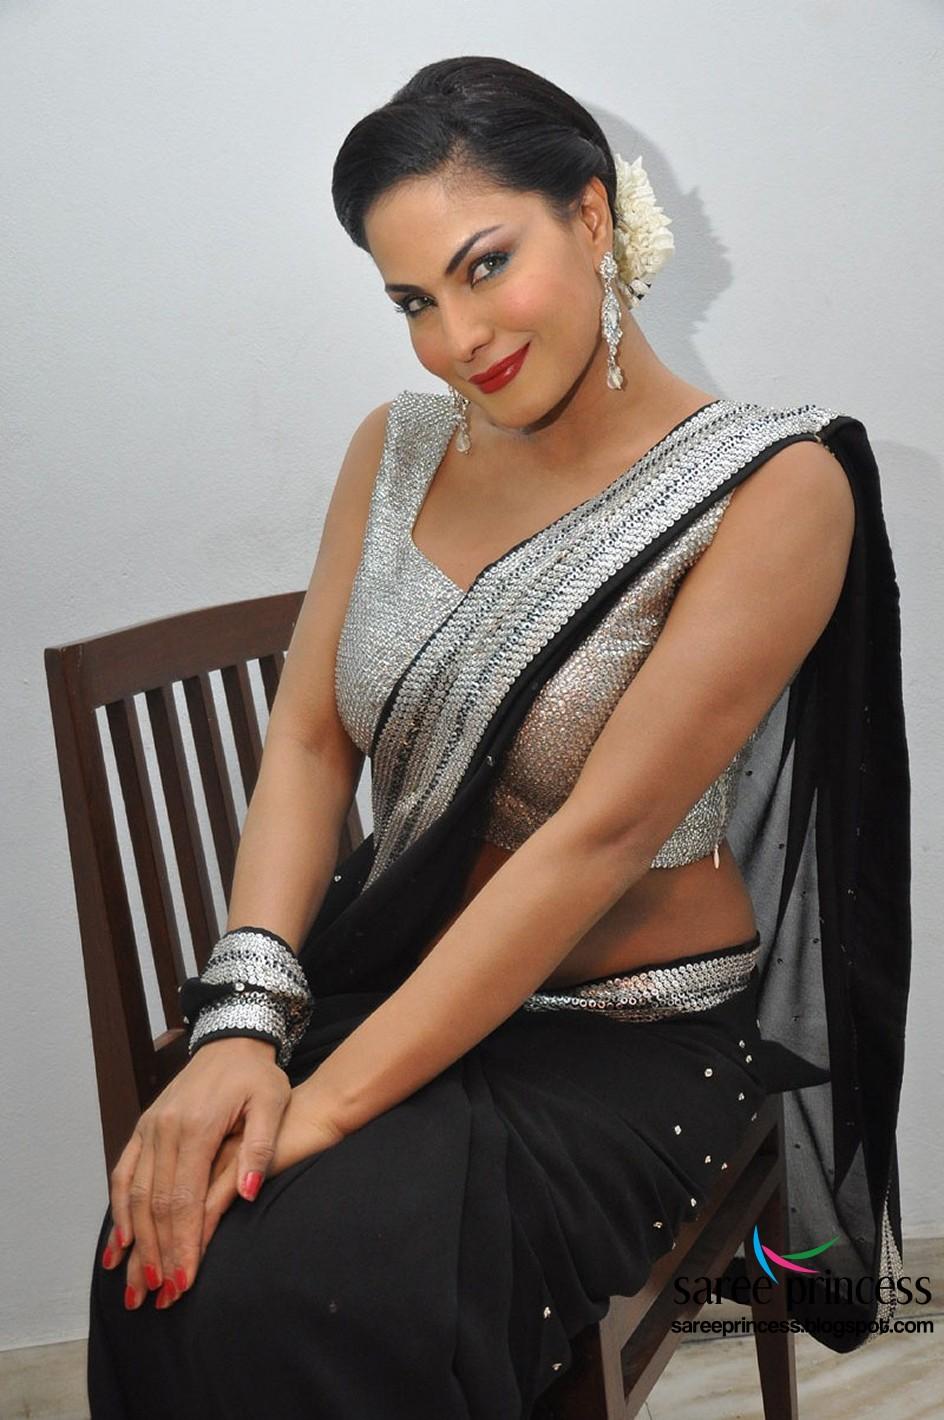 Hottest Paki Actress Veena Malik Looking Irresistibly Sexy -6578